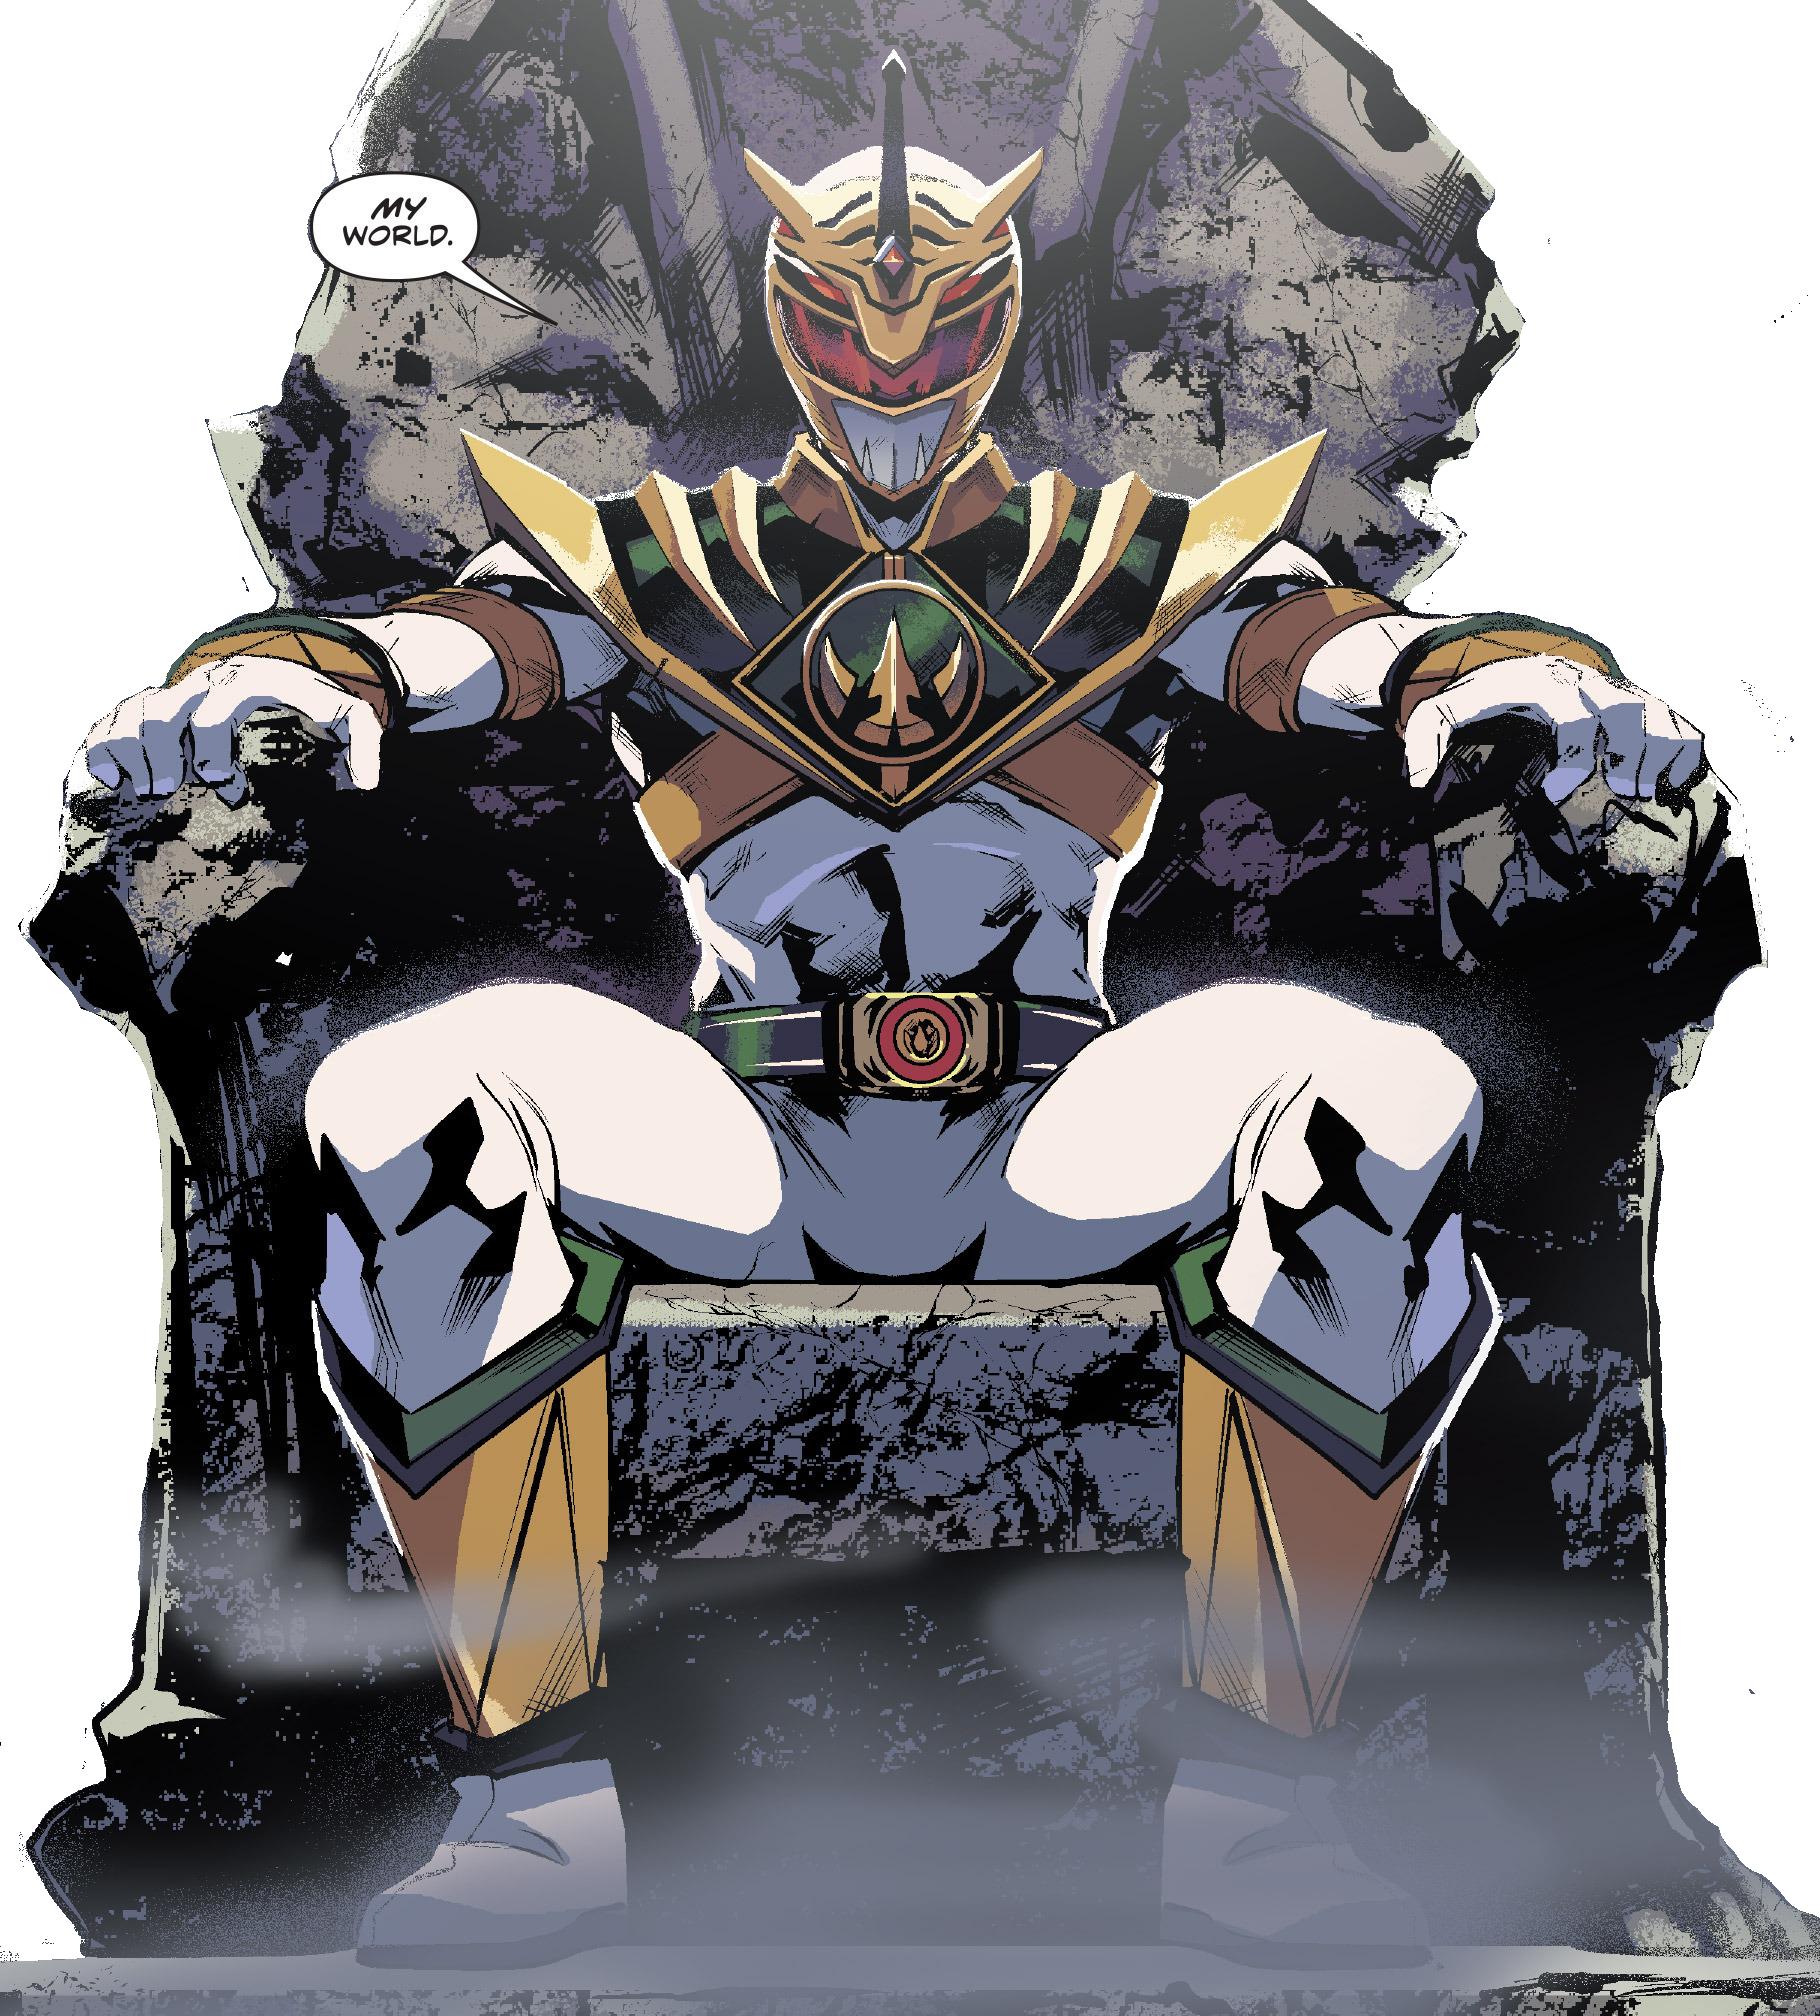 Lord Drakkon | VS Battles Wiki | FANDOM powered by Wikia